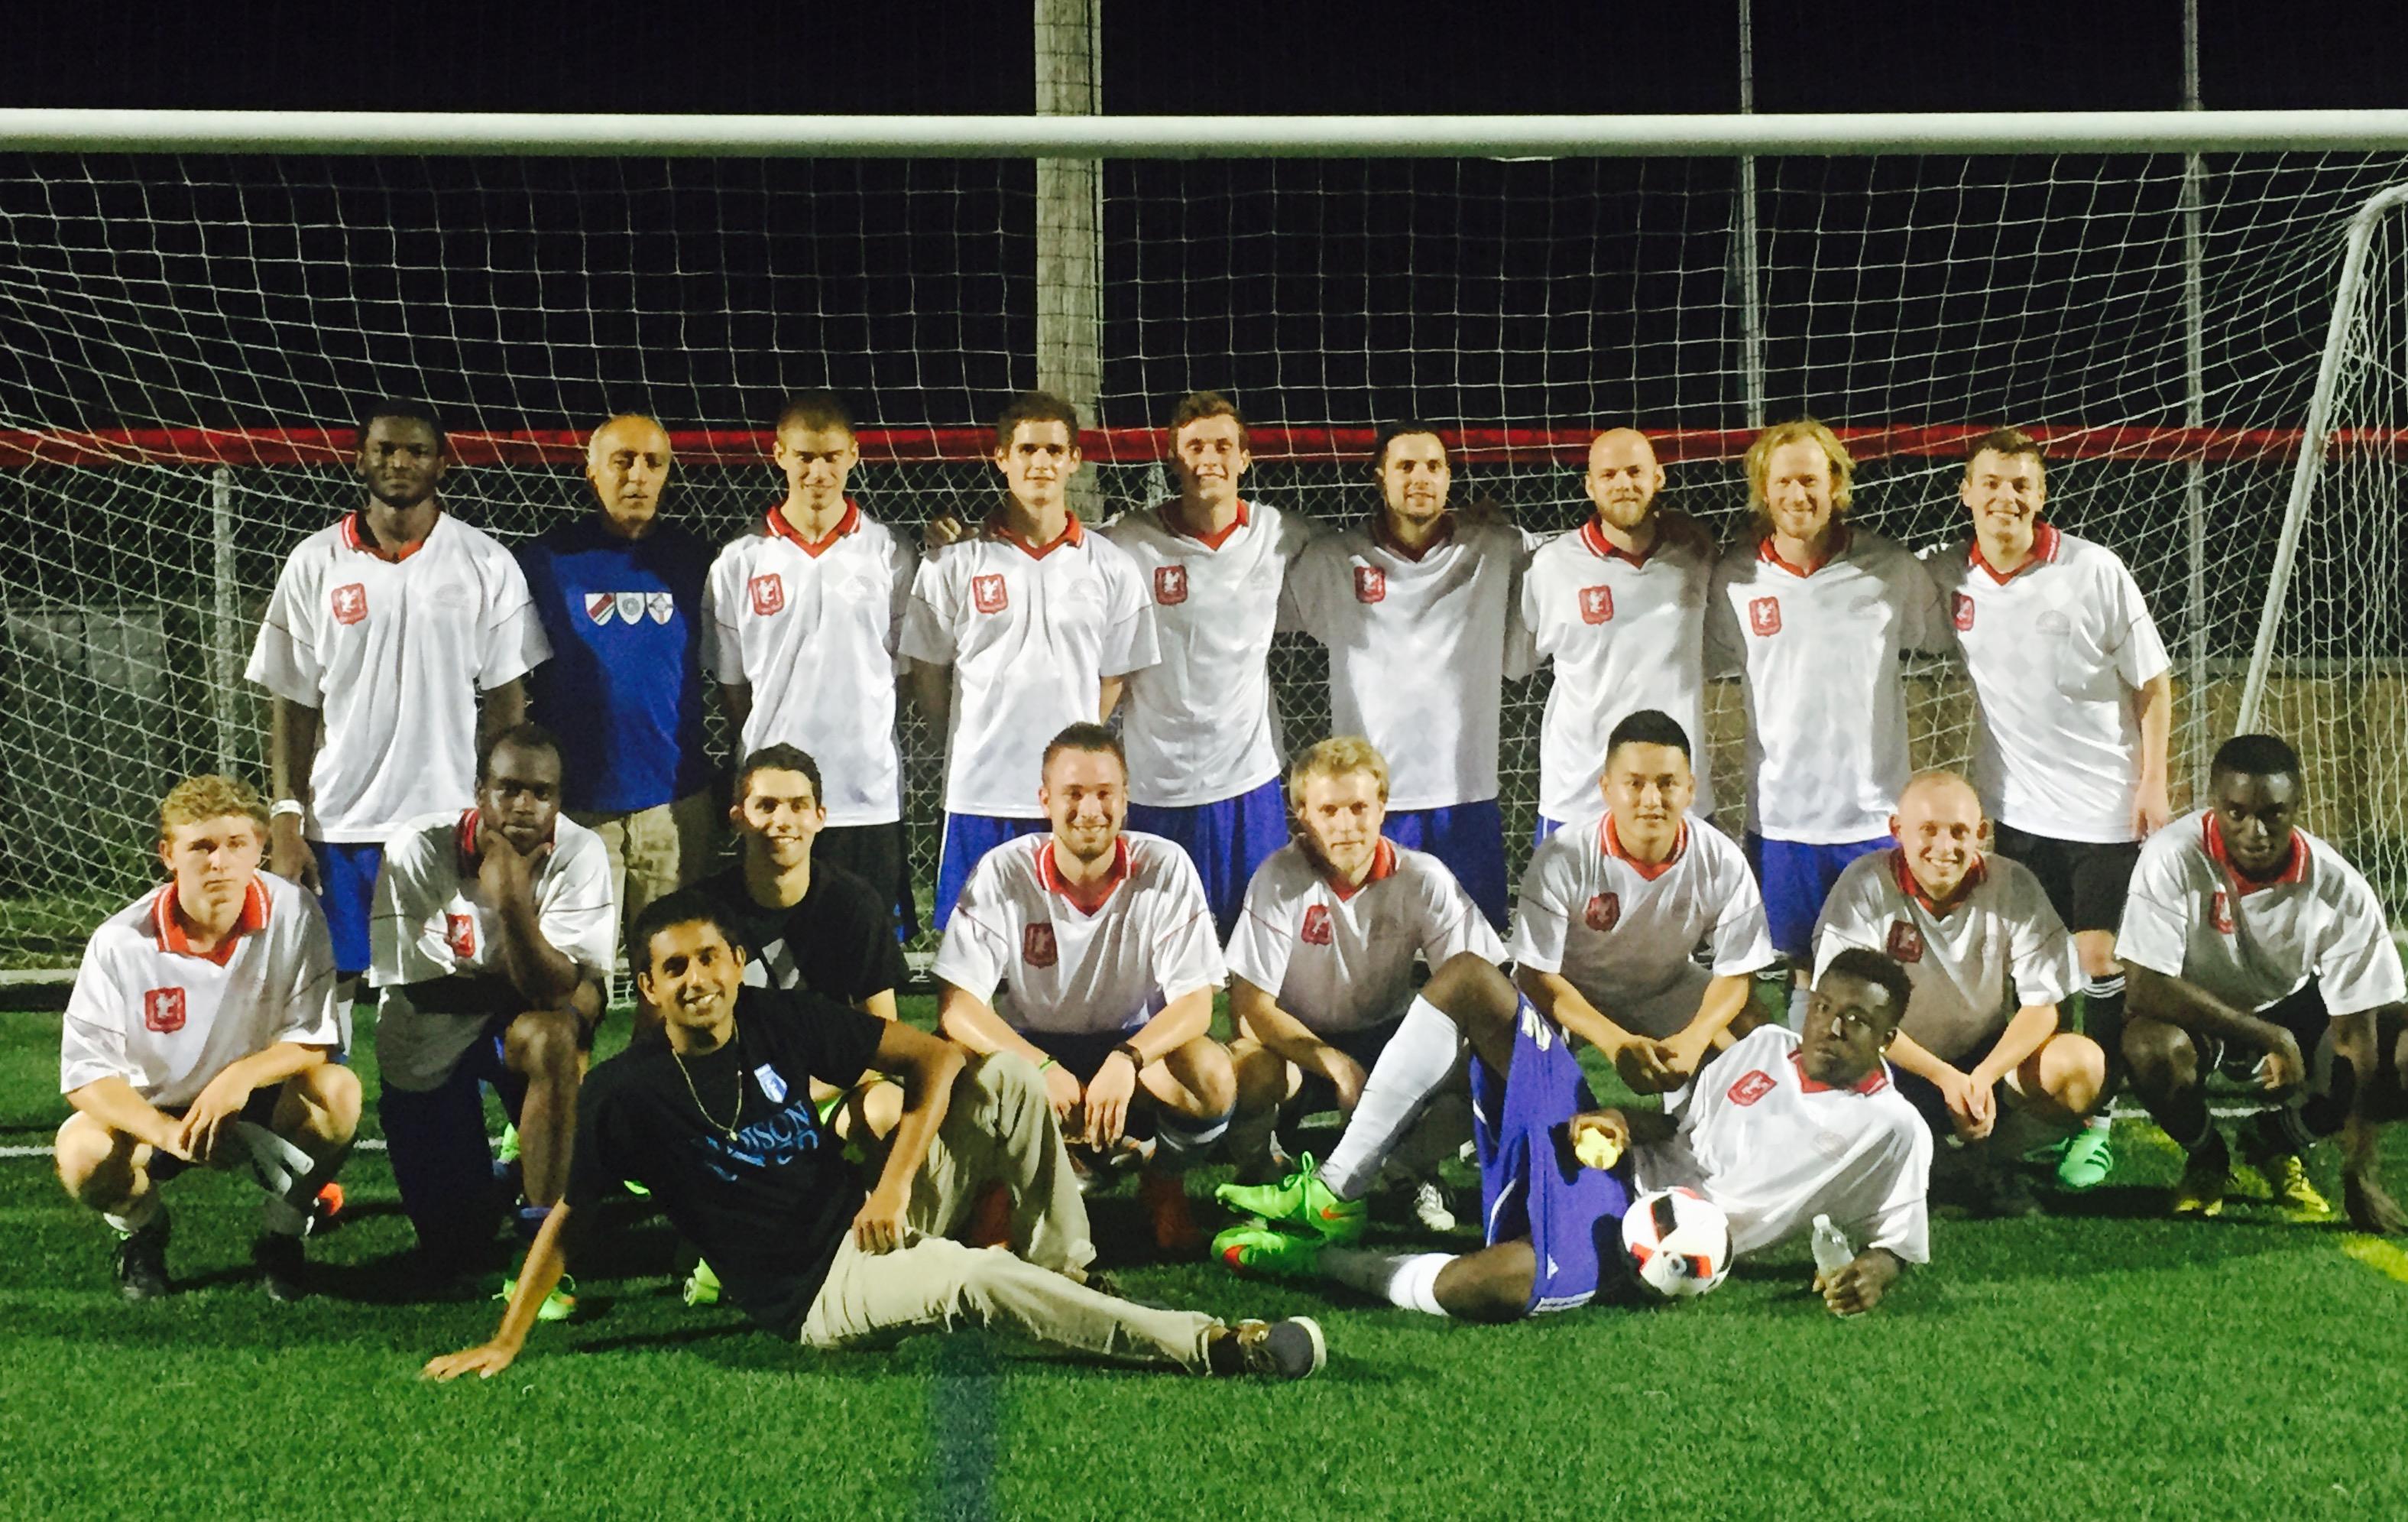 Madison United: 2015-16 Madison Soccer Association Division 1 Champions